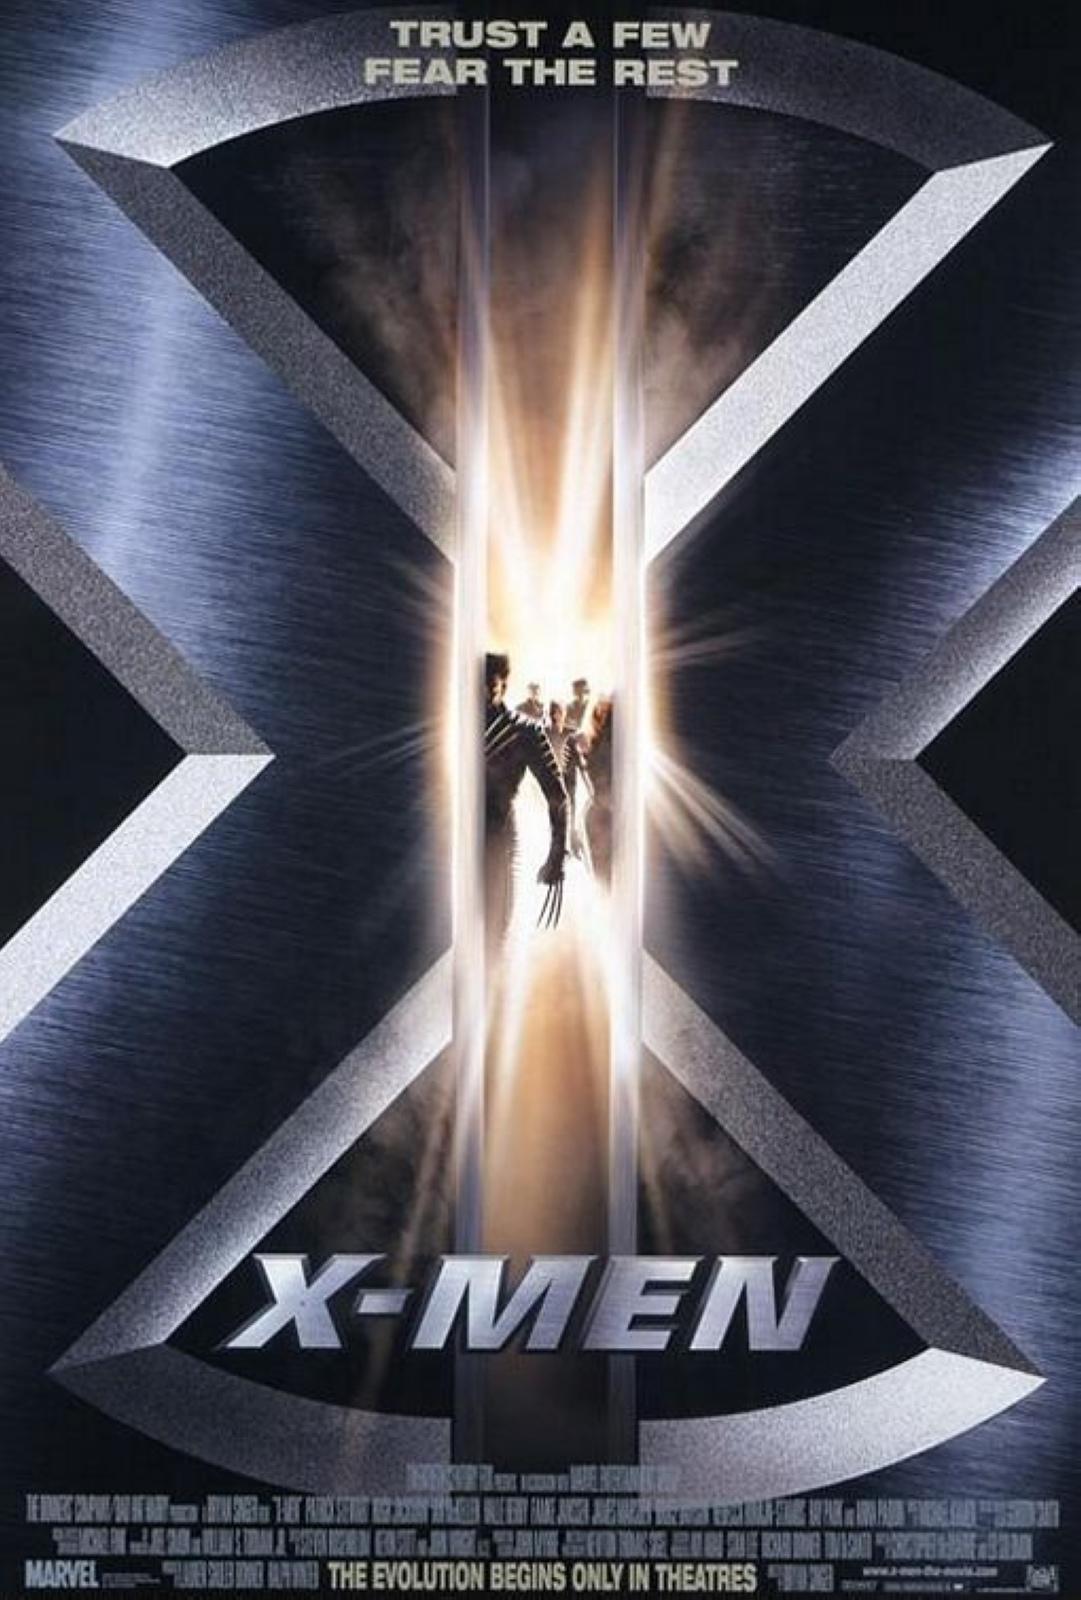 X-Men (2000) BluRay 480p, 720p, 1080p & 4K-2160p